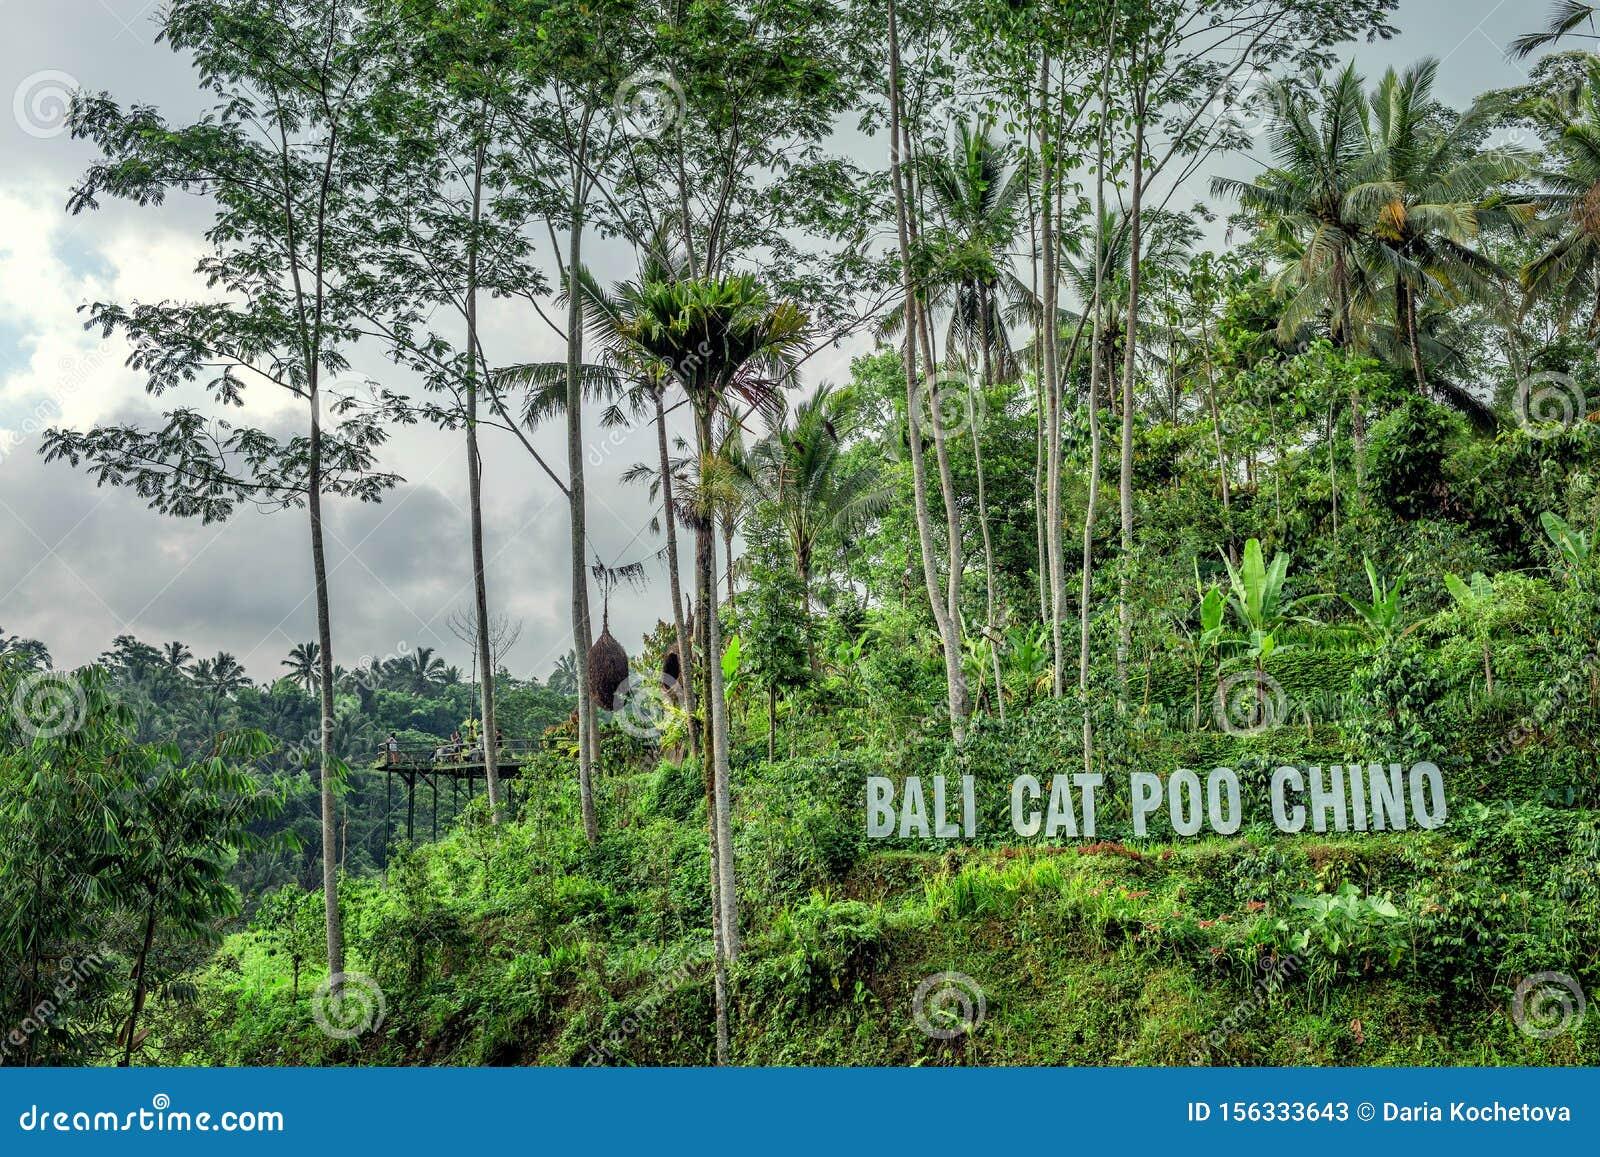 Bali Coffee Plantations   Luwak Coffee - Places to Visit  Kopi Luwak Coffee Plantations